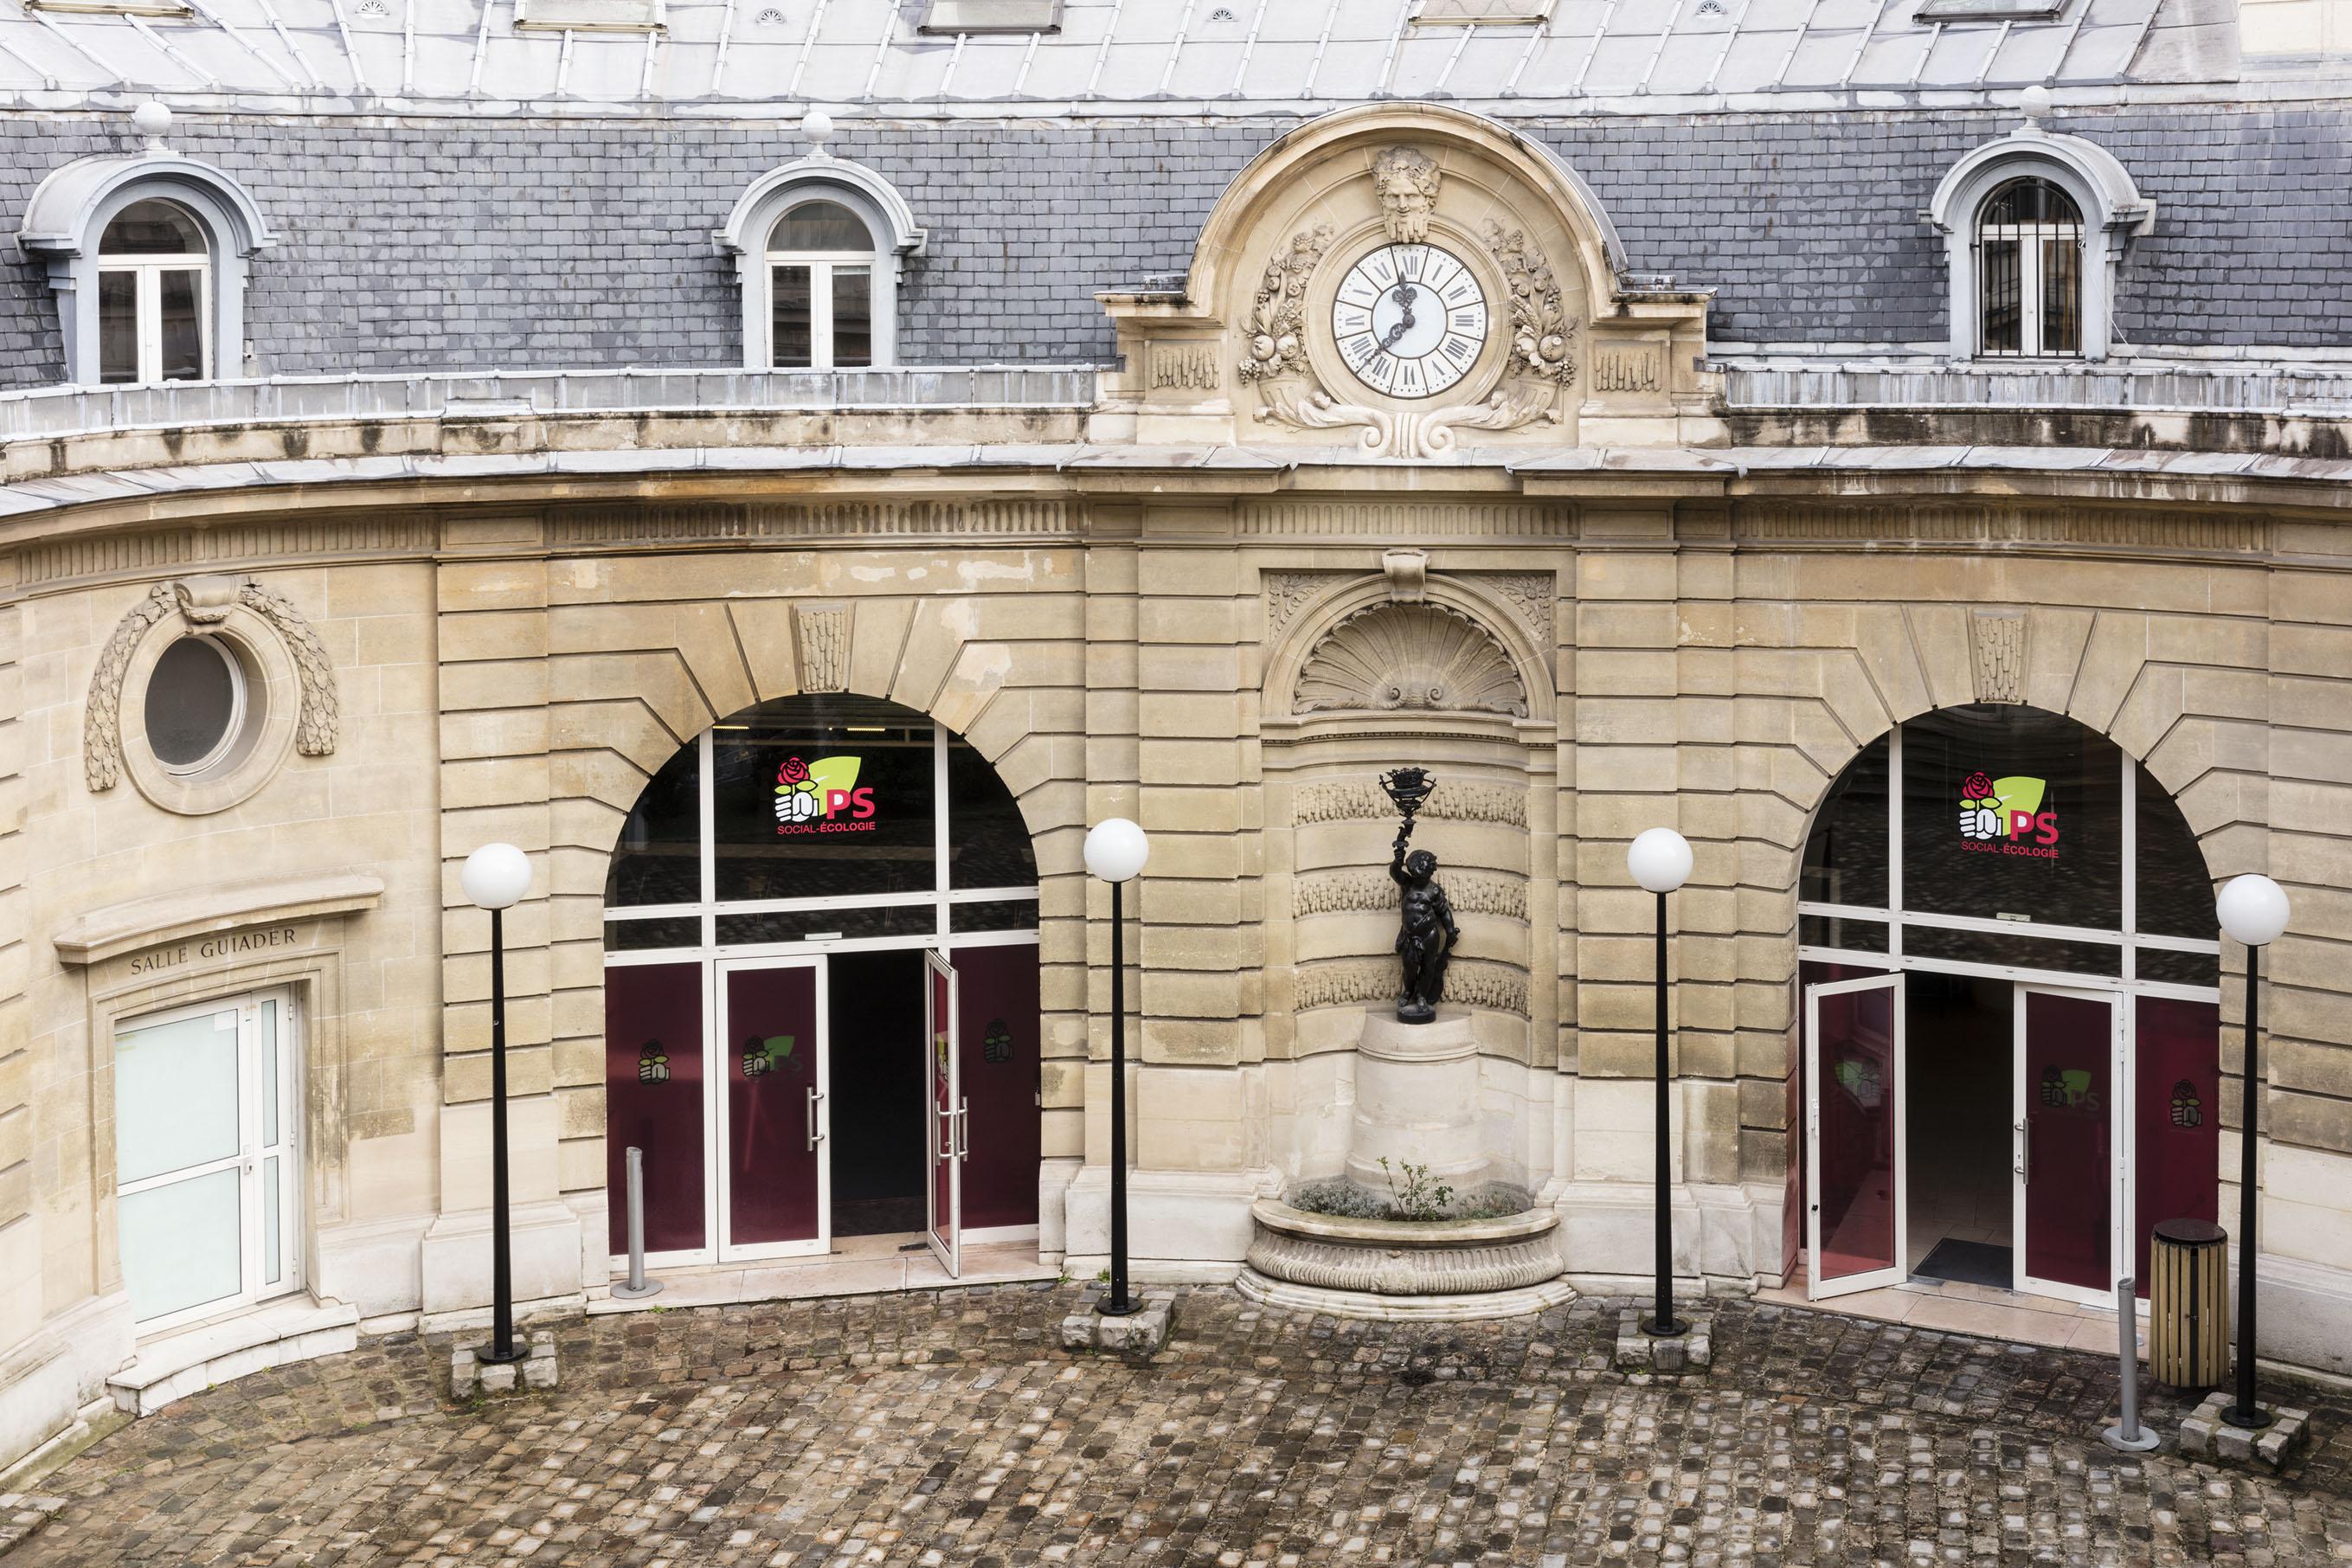 10 Rue de Solferino Cours Apsys G. Le Bras